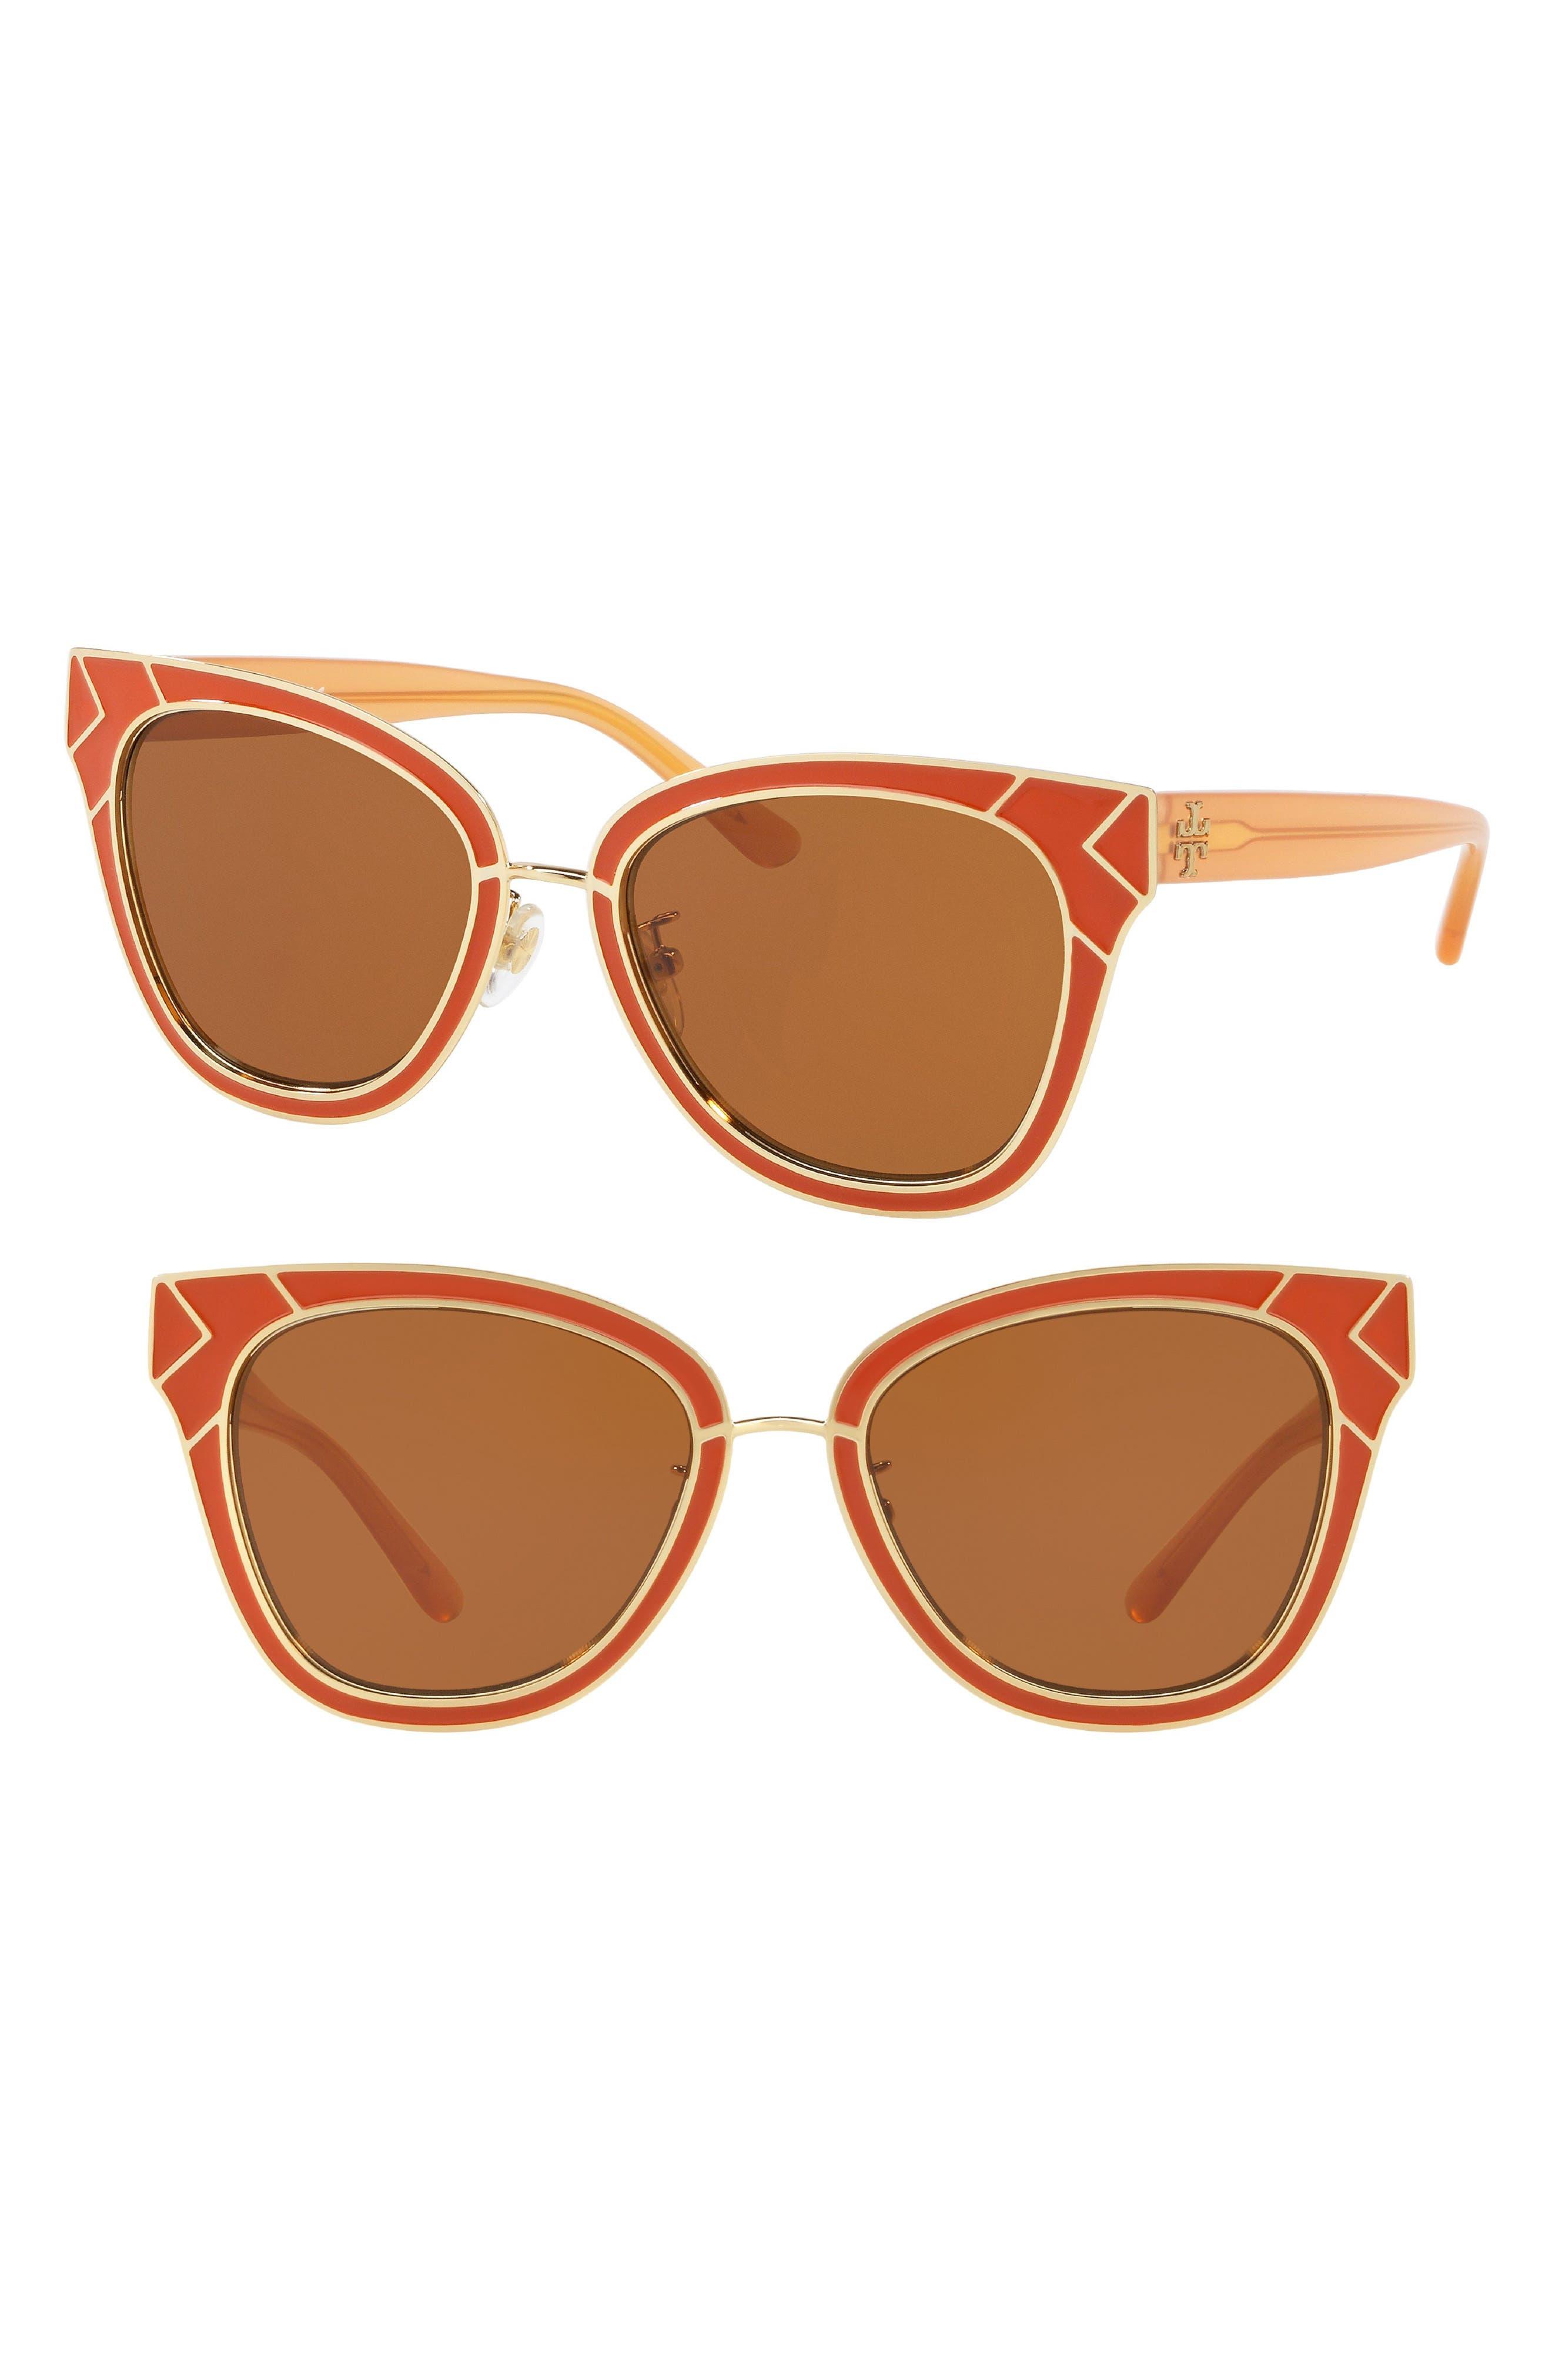 Enamel San Ray 53mm Sunglasses,                             Main thumbnail 1, color,                             Gold/ Orange